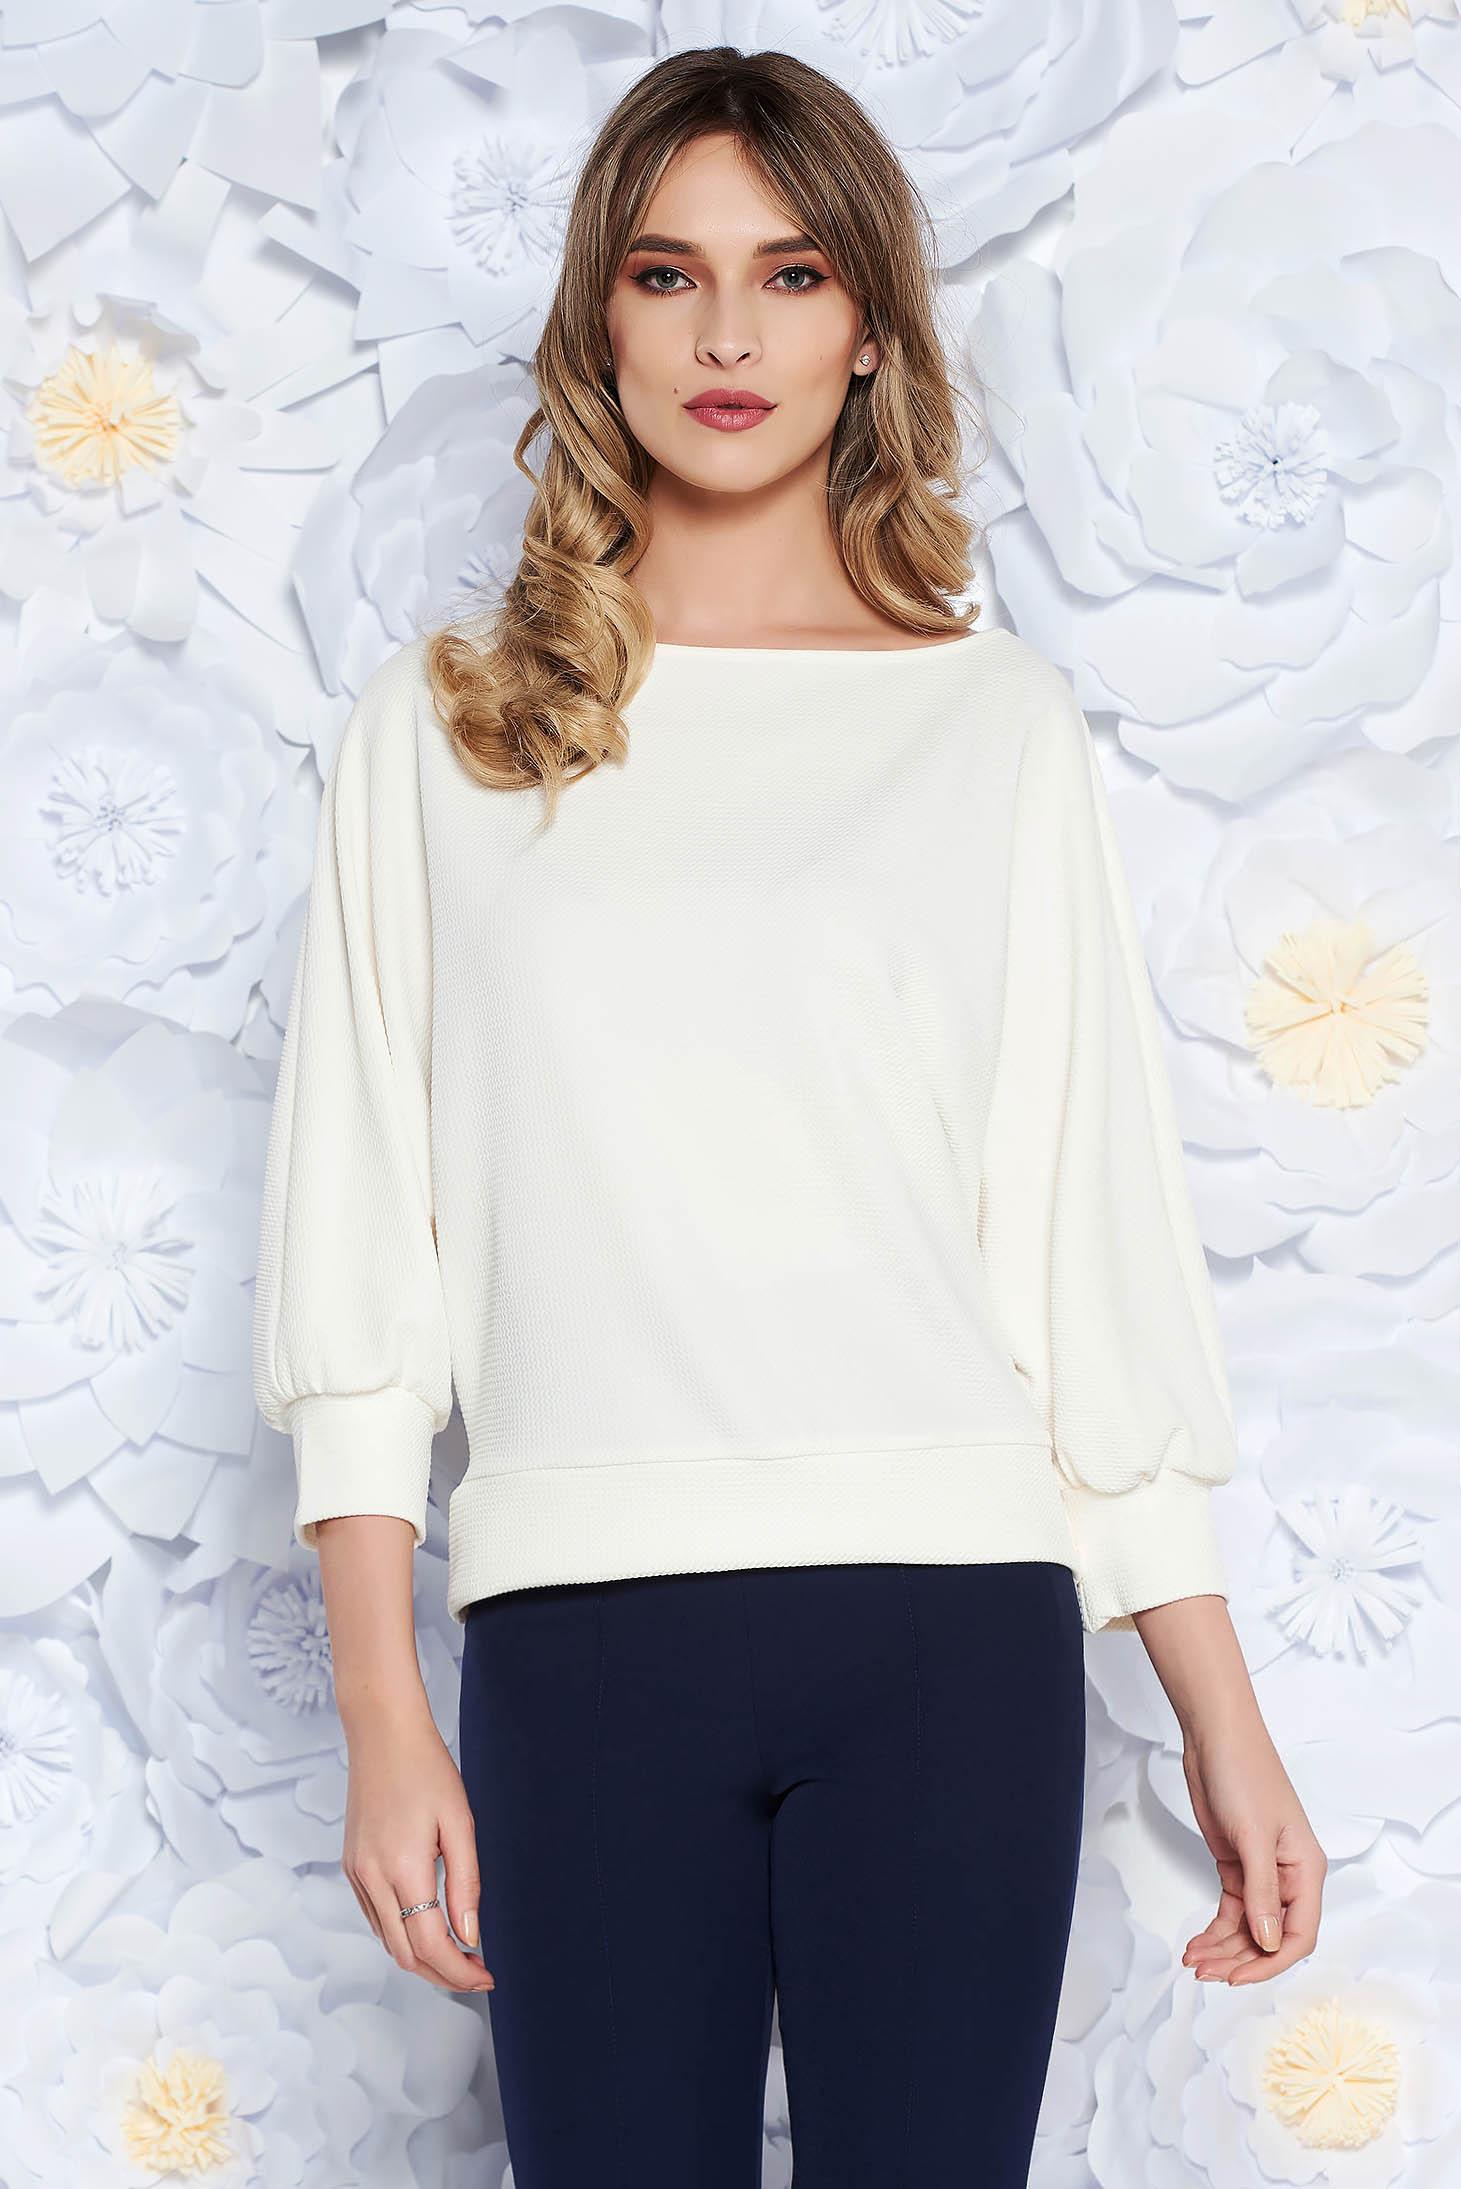 cbb9ec7d2351 starshiners-white-women`s-blouse-with-easy-cut-off-S041960-1-407910.jpg